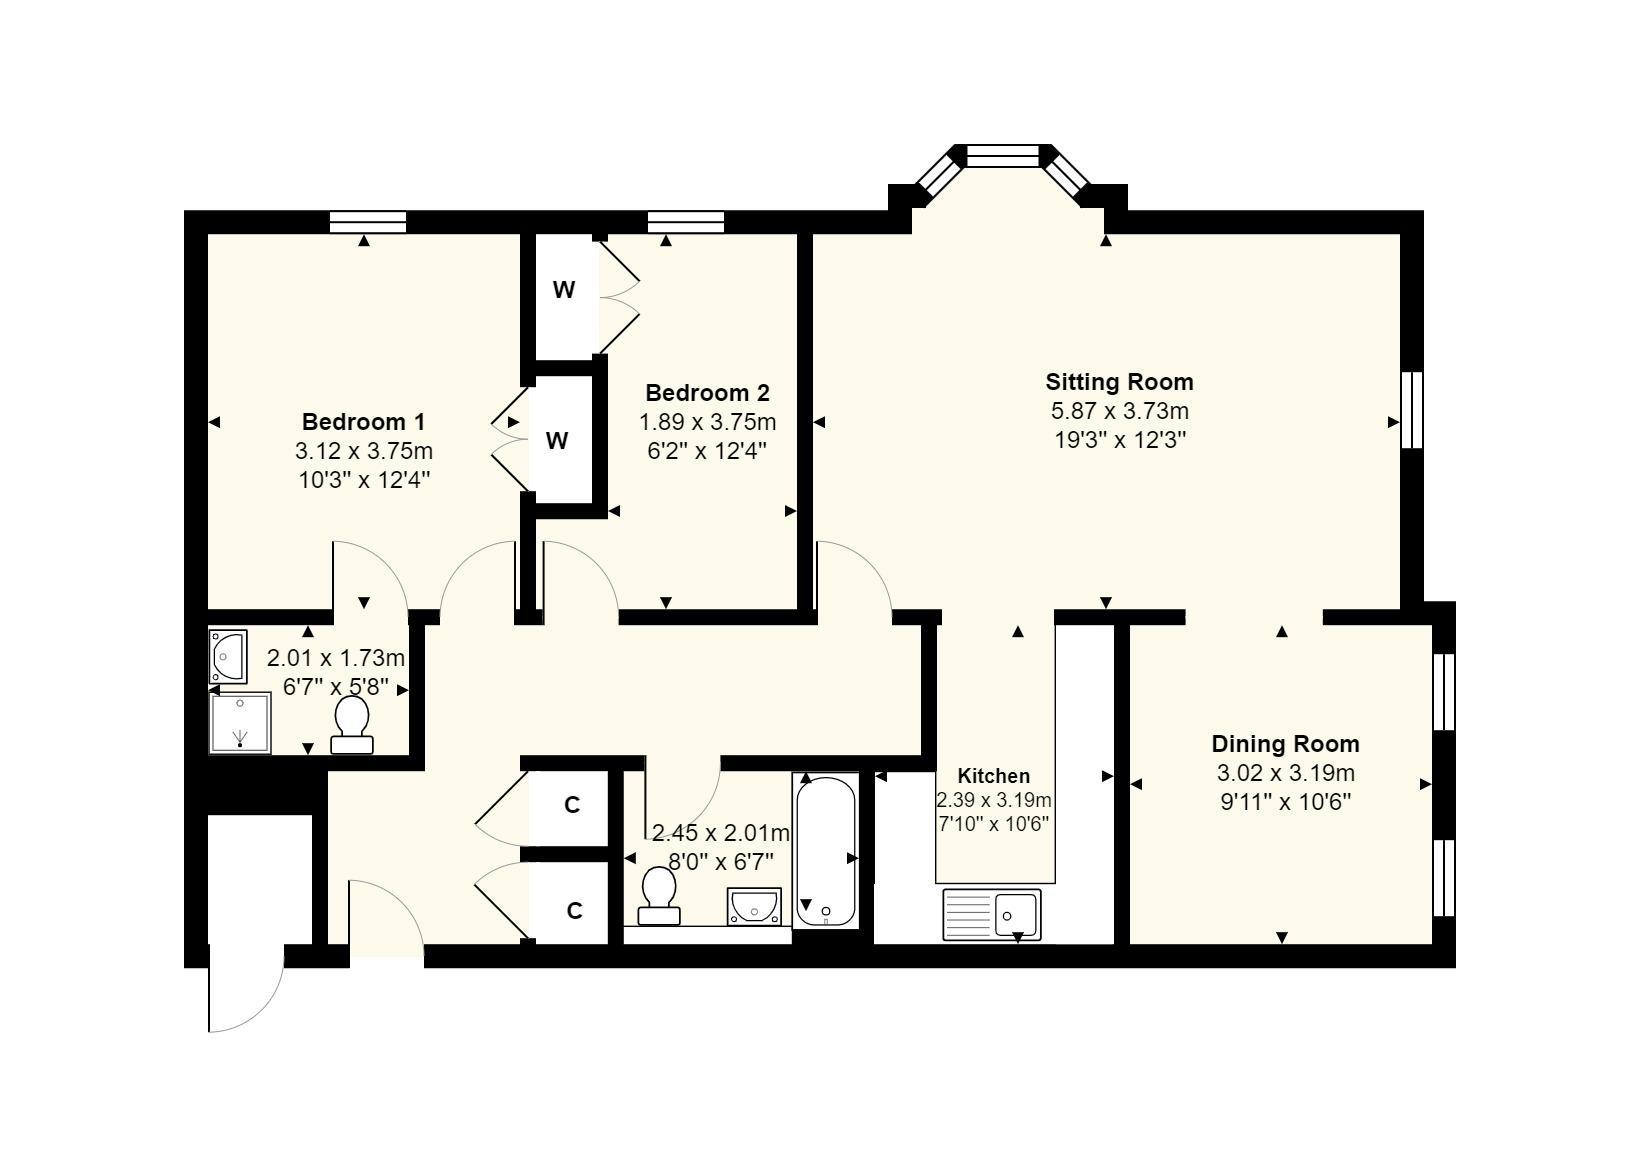 74 Sherford Lodge Floorplan